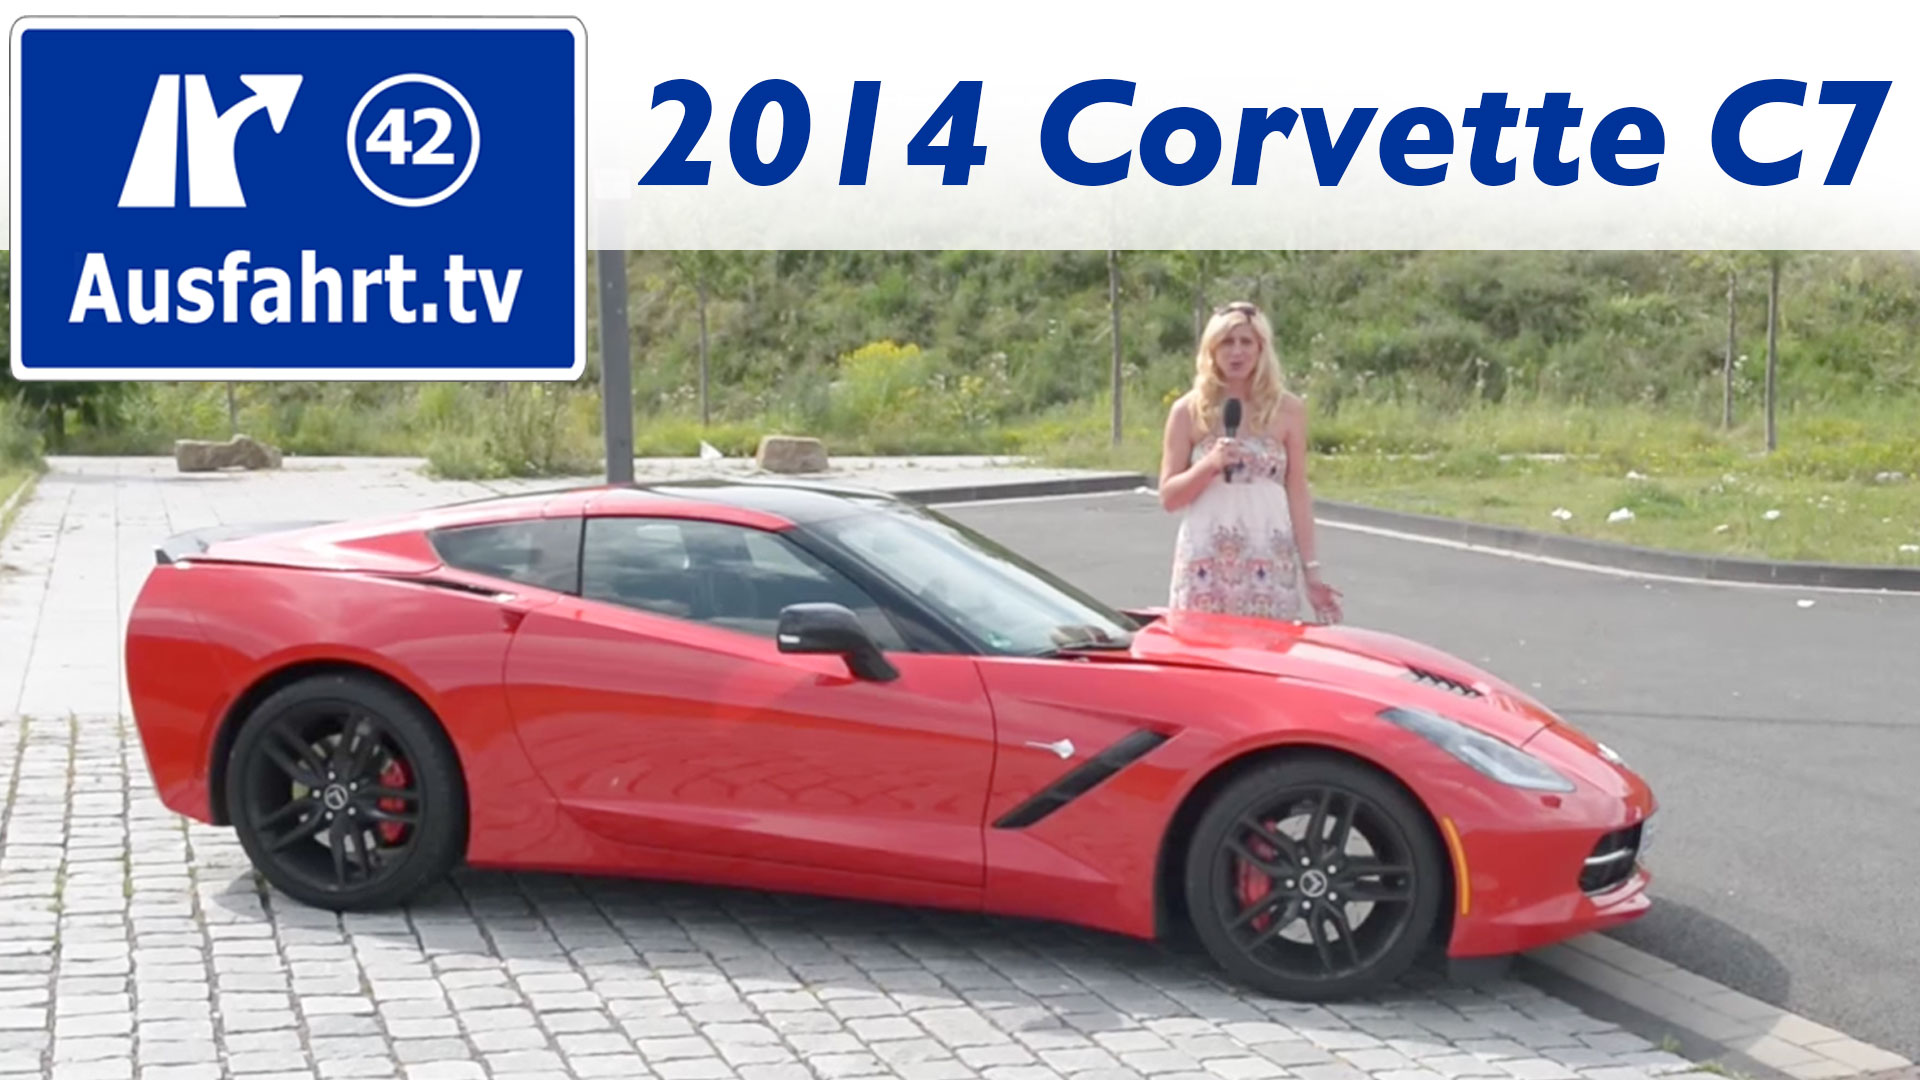 2014 Chevrolet Corvette Stingray C7 Ausfahrt Tv